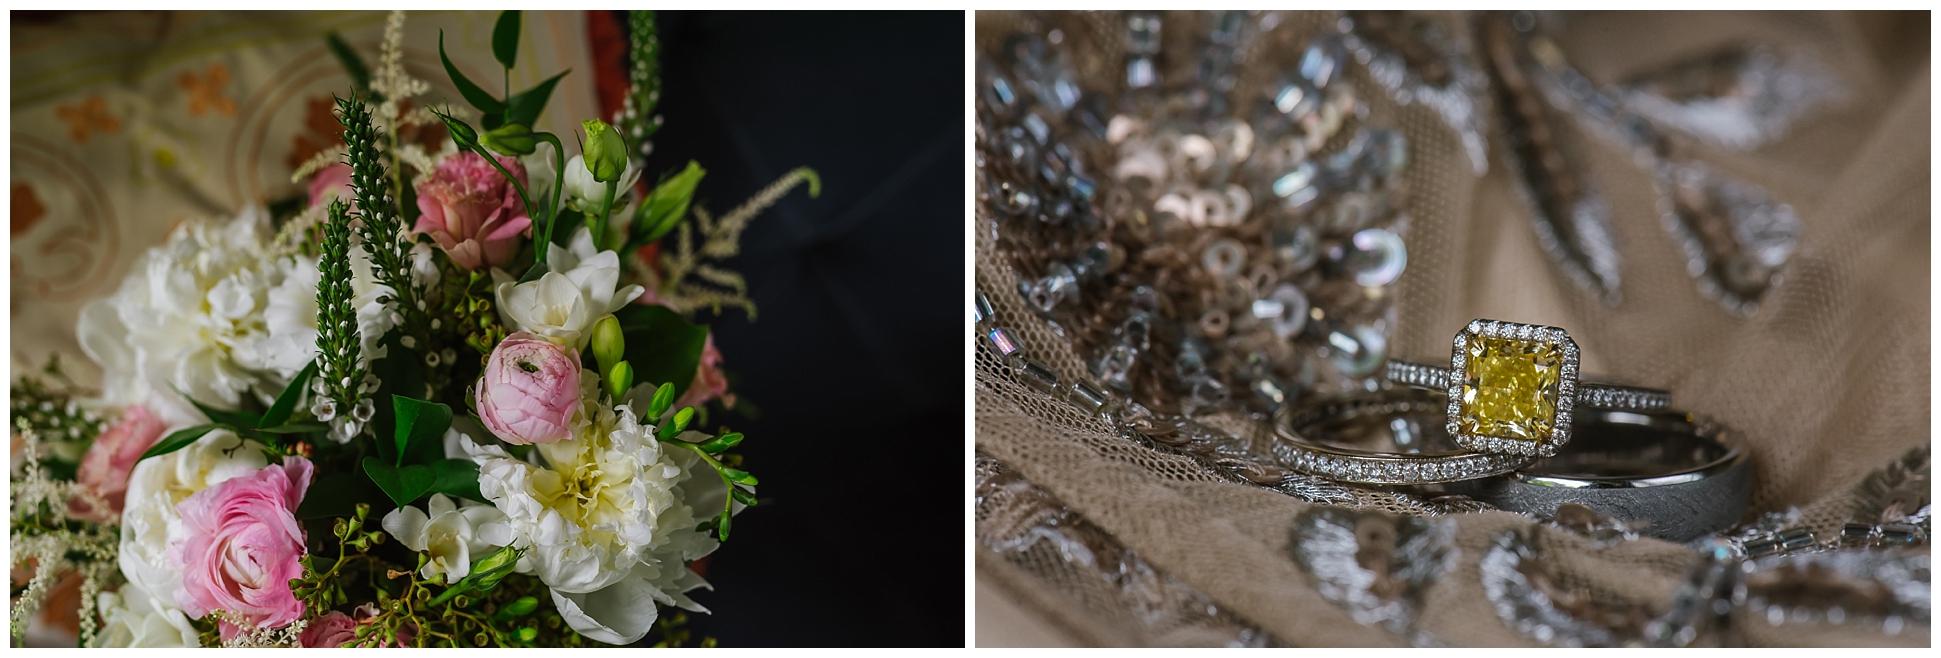 st-pete-wedding-photographer-italian-romance-theme-rustic-flower-crown_0365.jpg